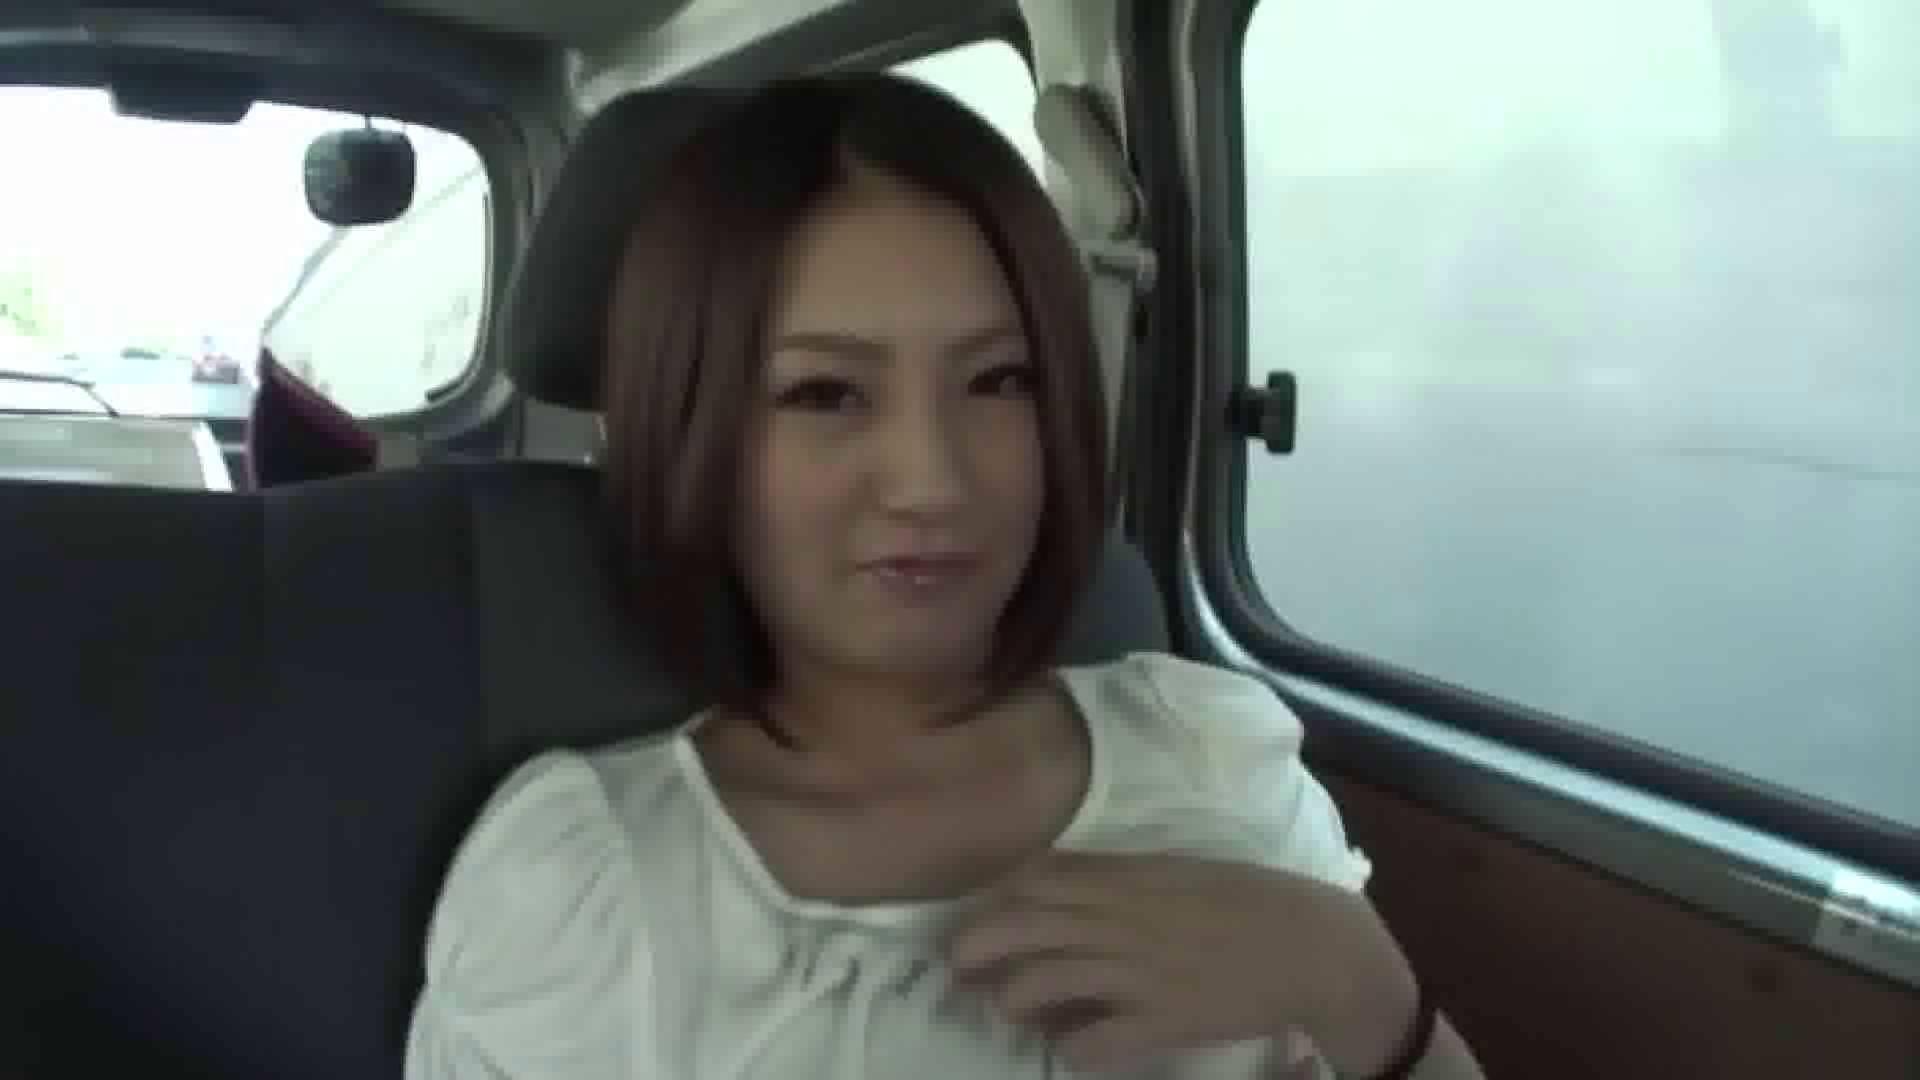 Hで可愛くてケシカラン! Vol.16 車   美女  59連発 7